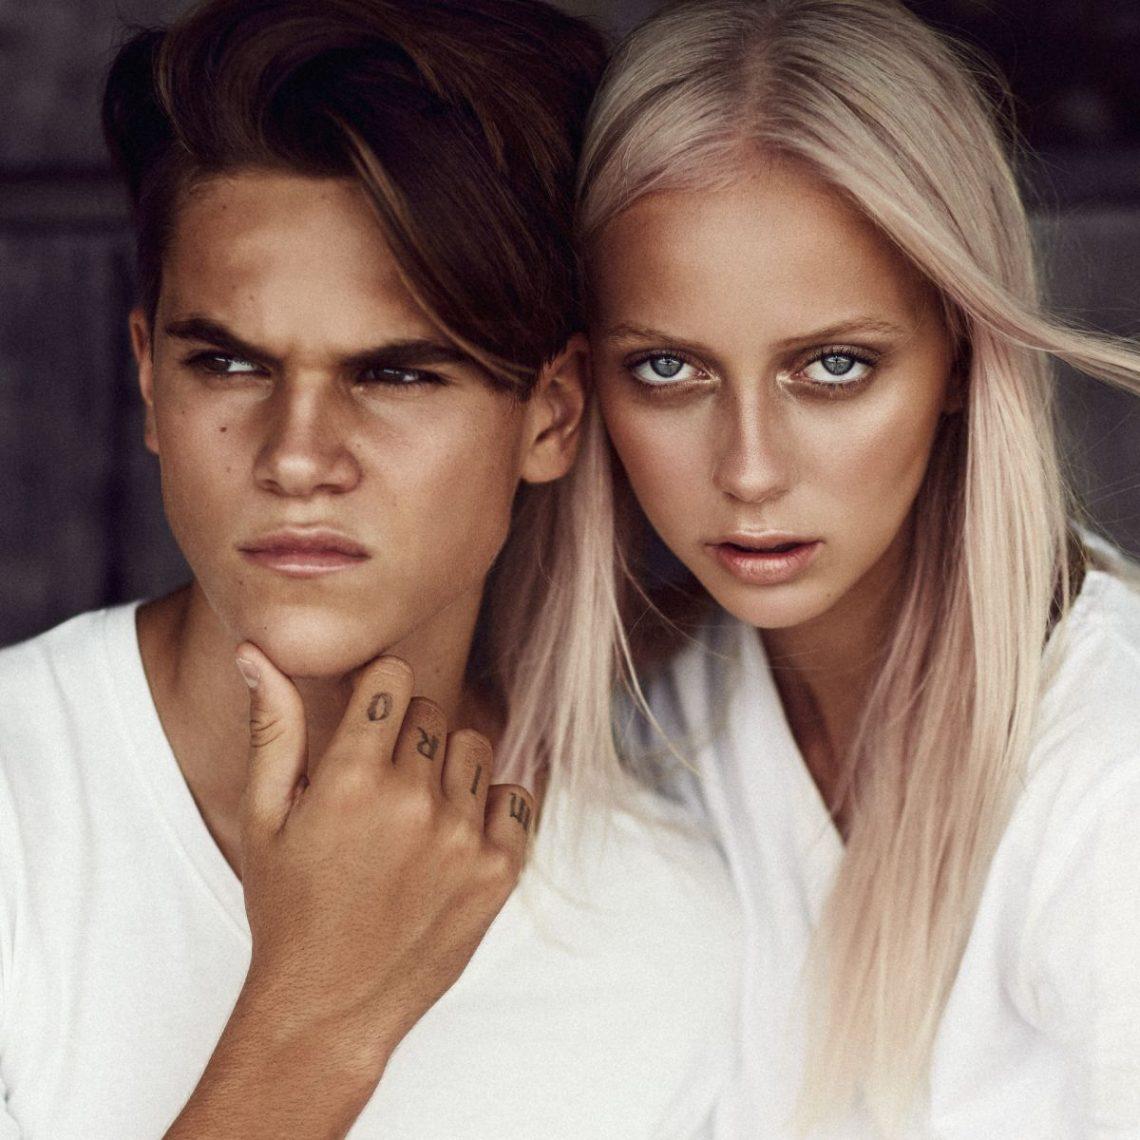 Balistarz-model-Brodie-Halford-fashion-portfolio-portrair-with-male-model